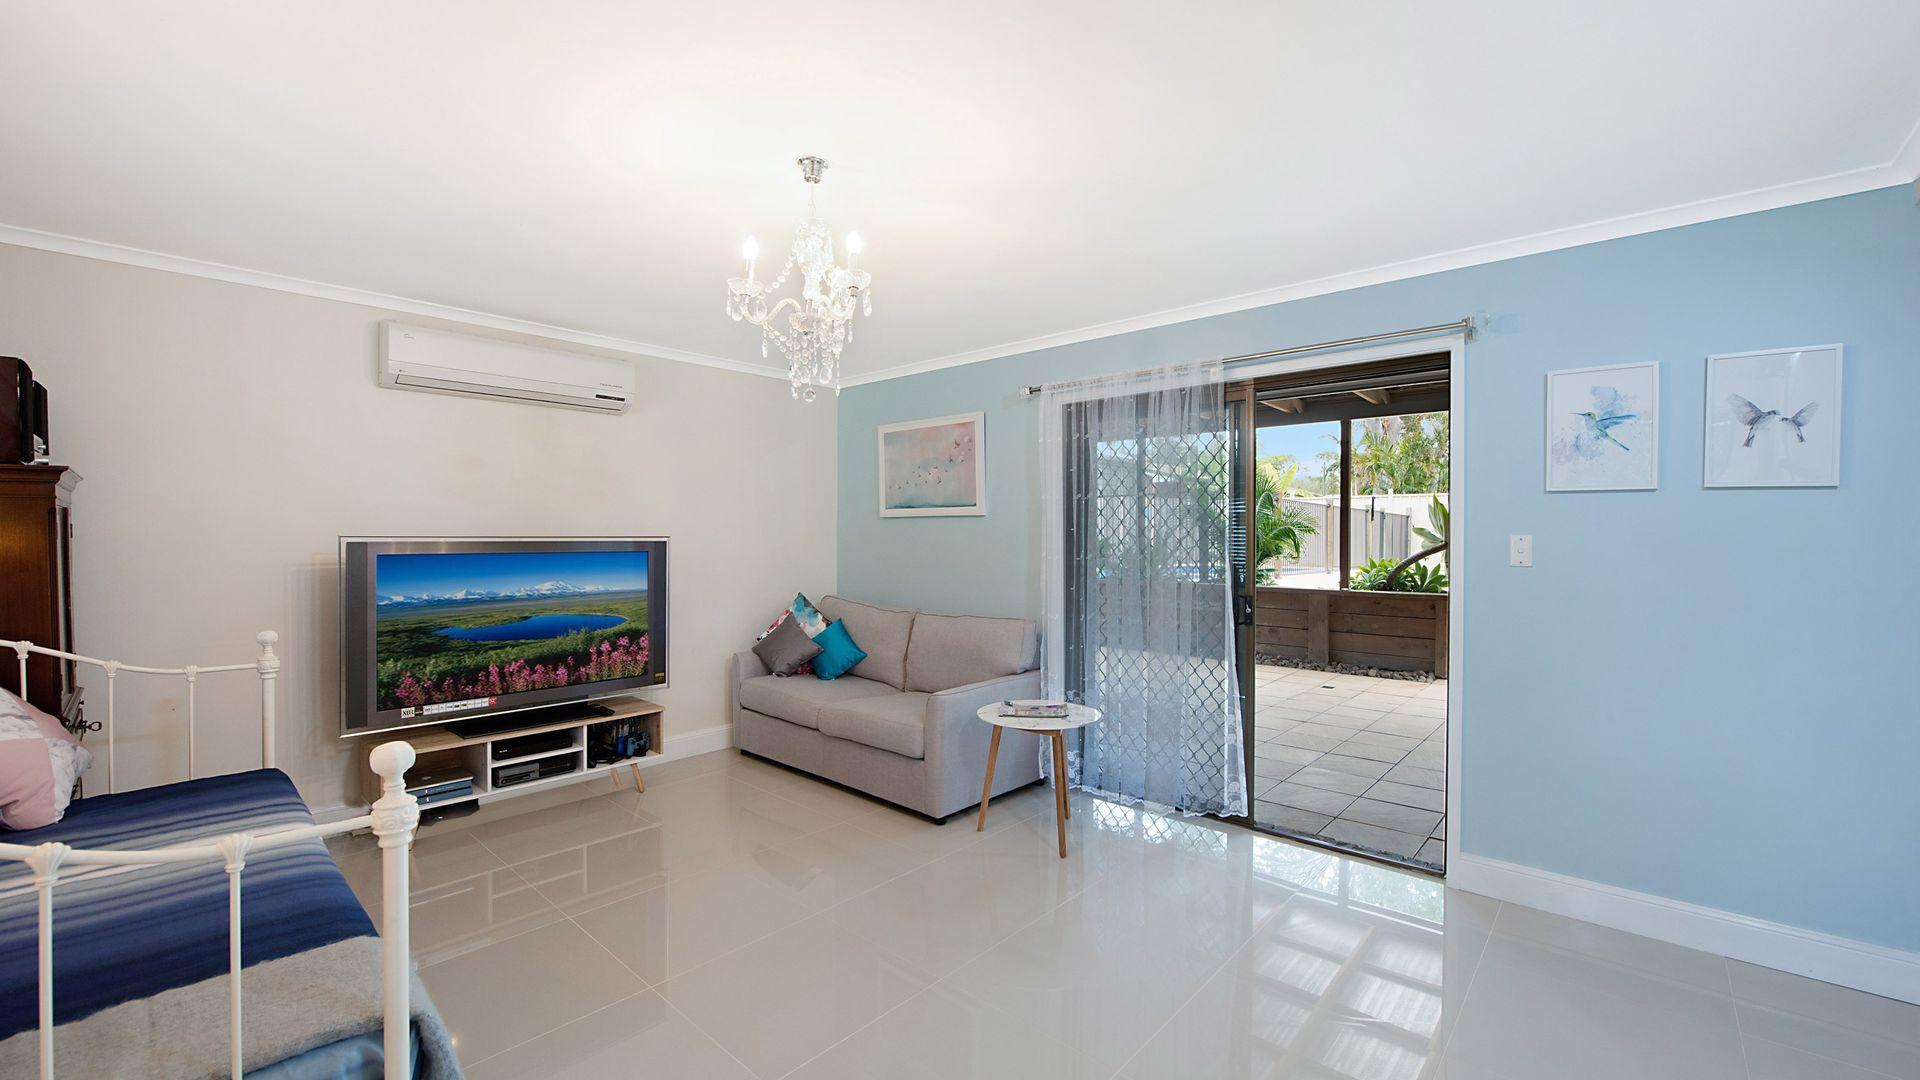 7 Kookaburra Lane, Noosa Heads QLD 4567, Image 2